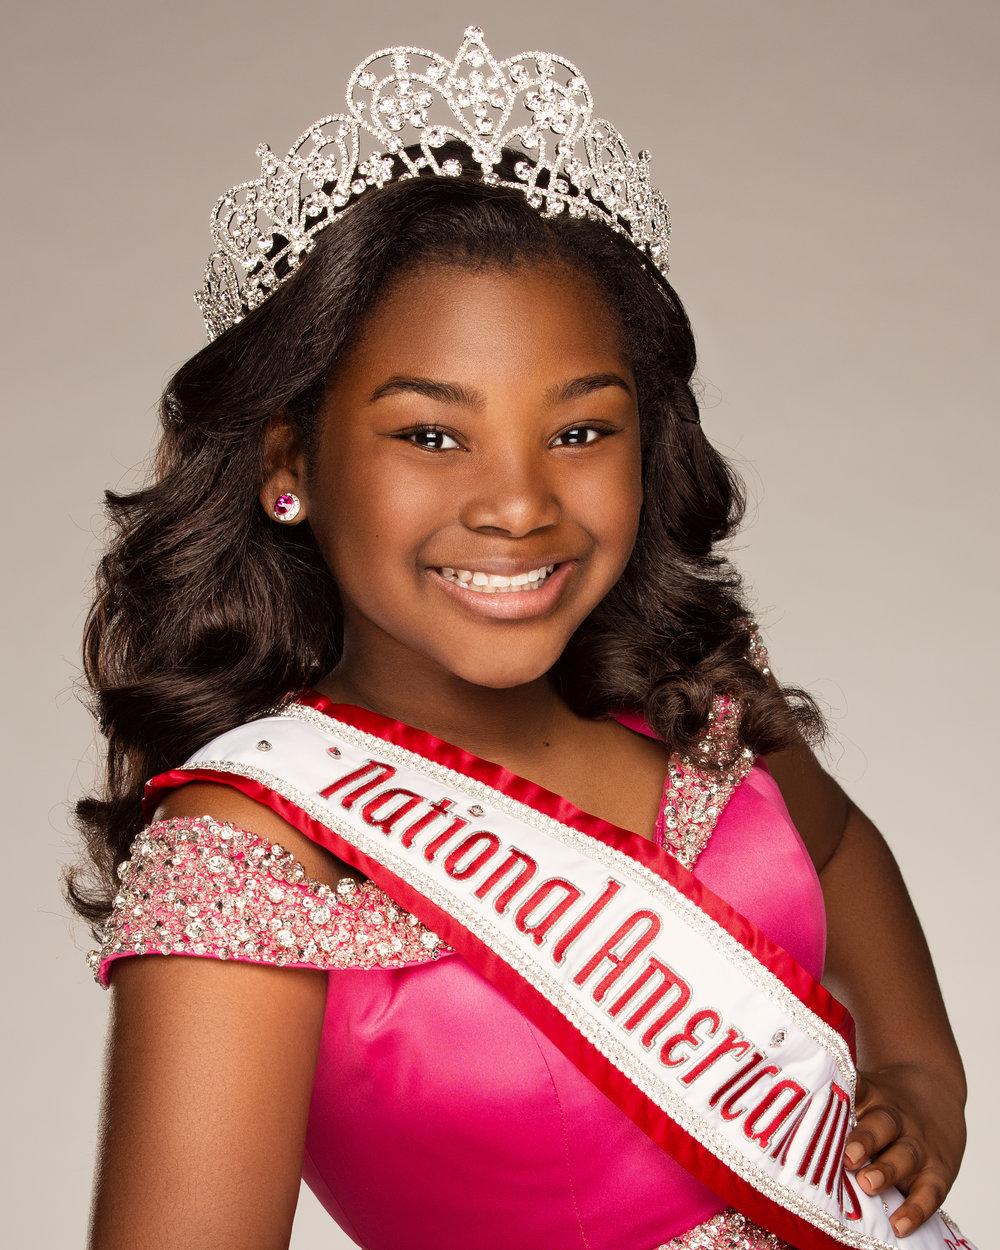 Kai - 2019 National American Miss Pre Teen